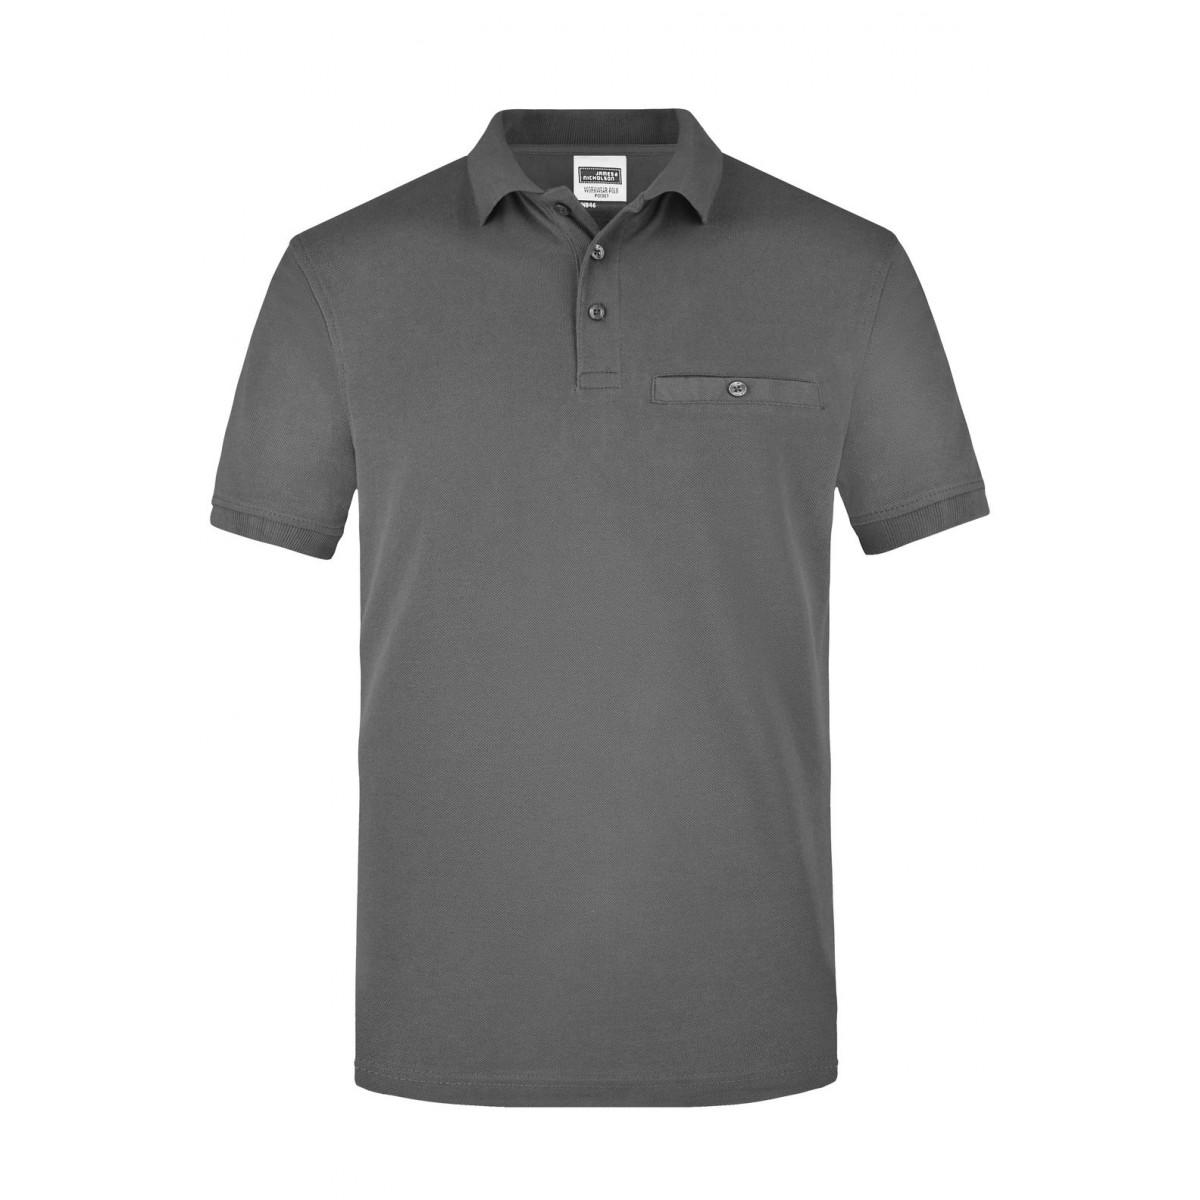 Рубашка поло мужская JN846 Men´s Workwear Polo Pocket - Темно-серый